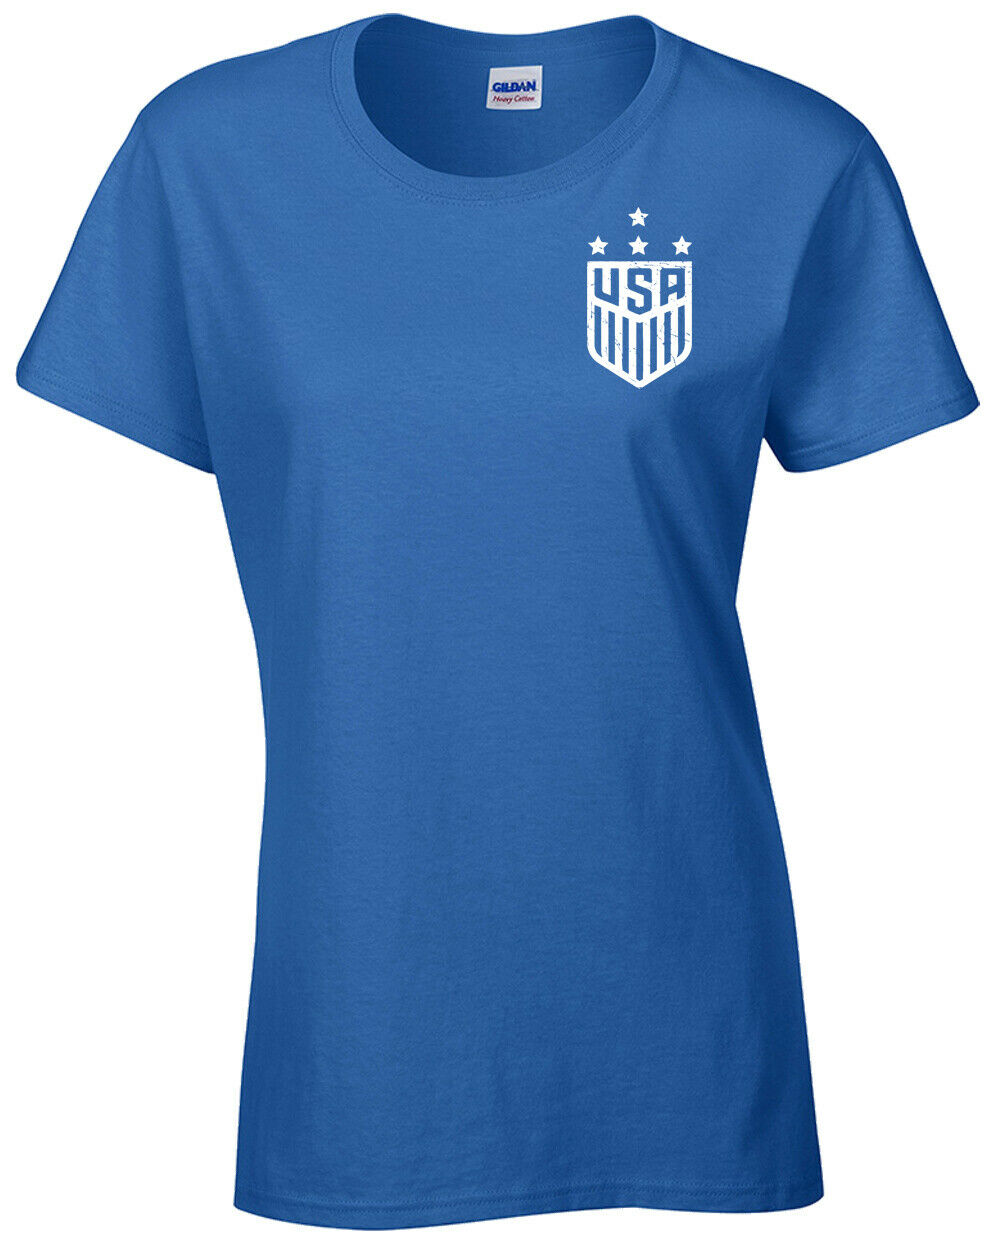 BECKY SAUERBRUNN United States Women/'s Soccer Team 2 Sides LADIES Tee Shirt 1188